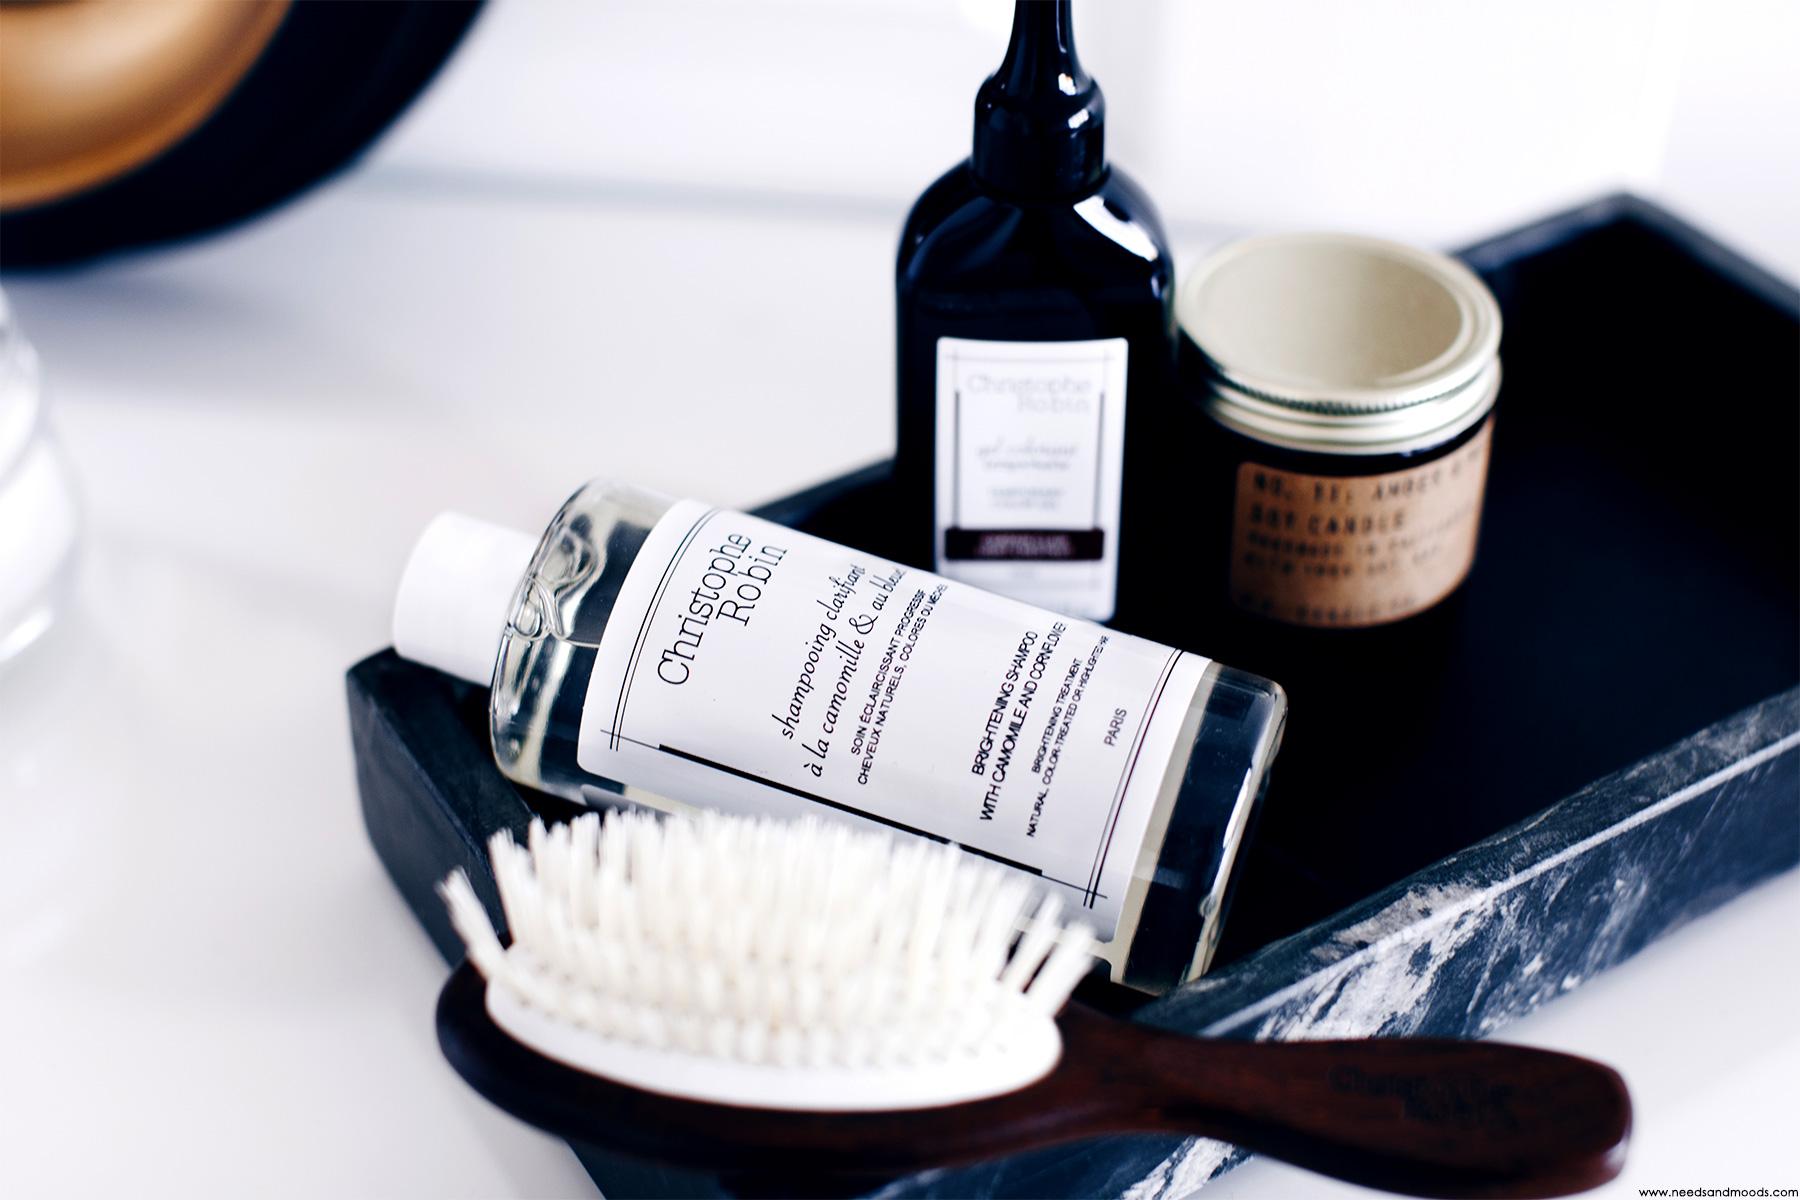 shampooing clarifiant camomille bleuet christophe robin avis